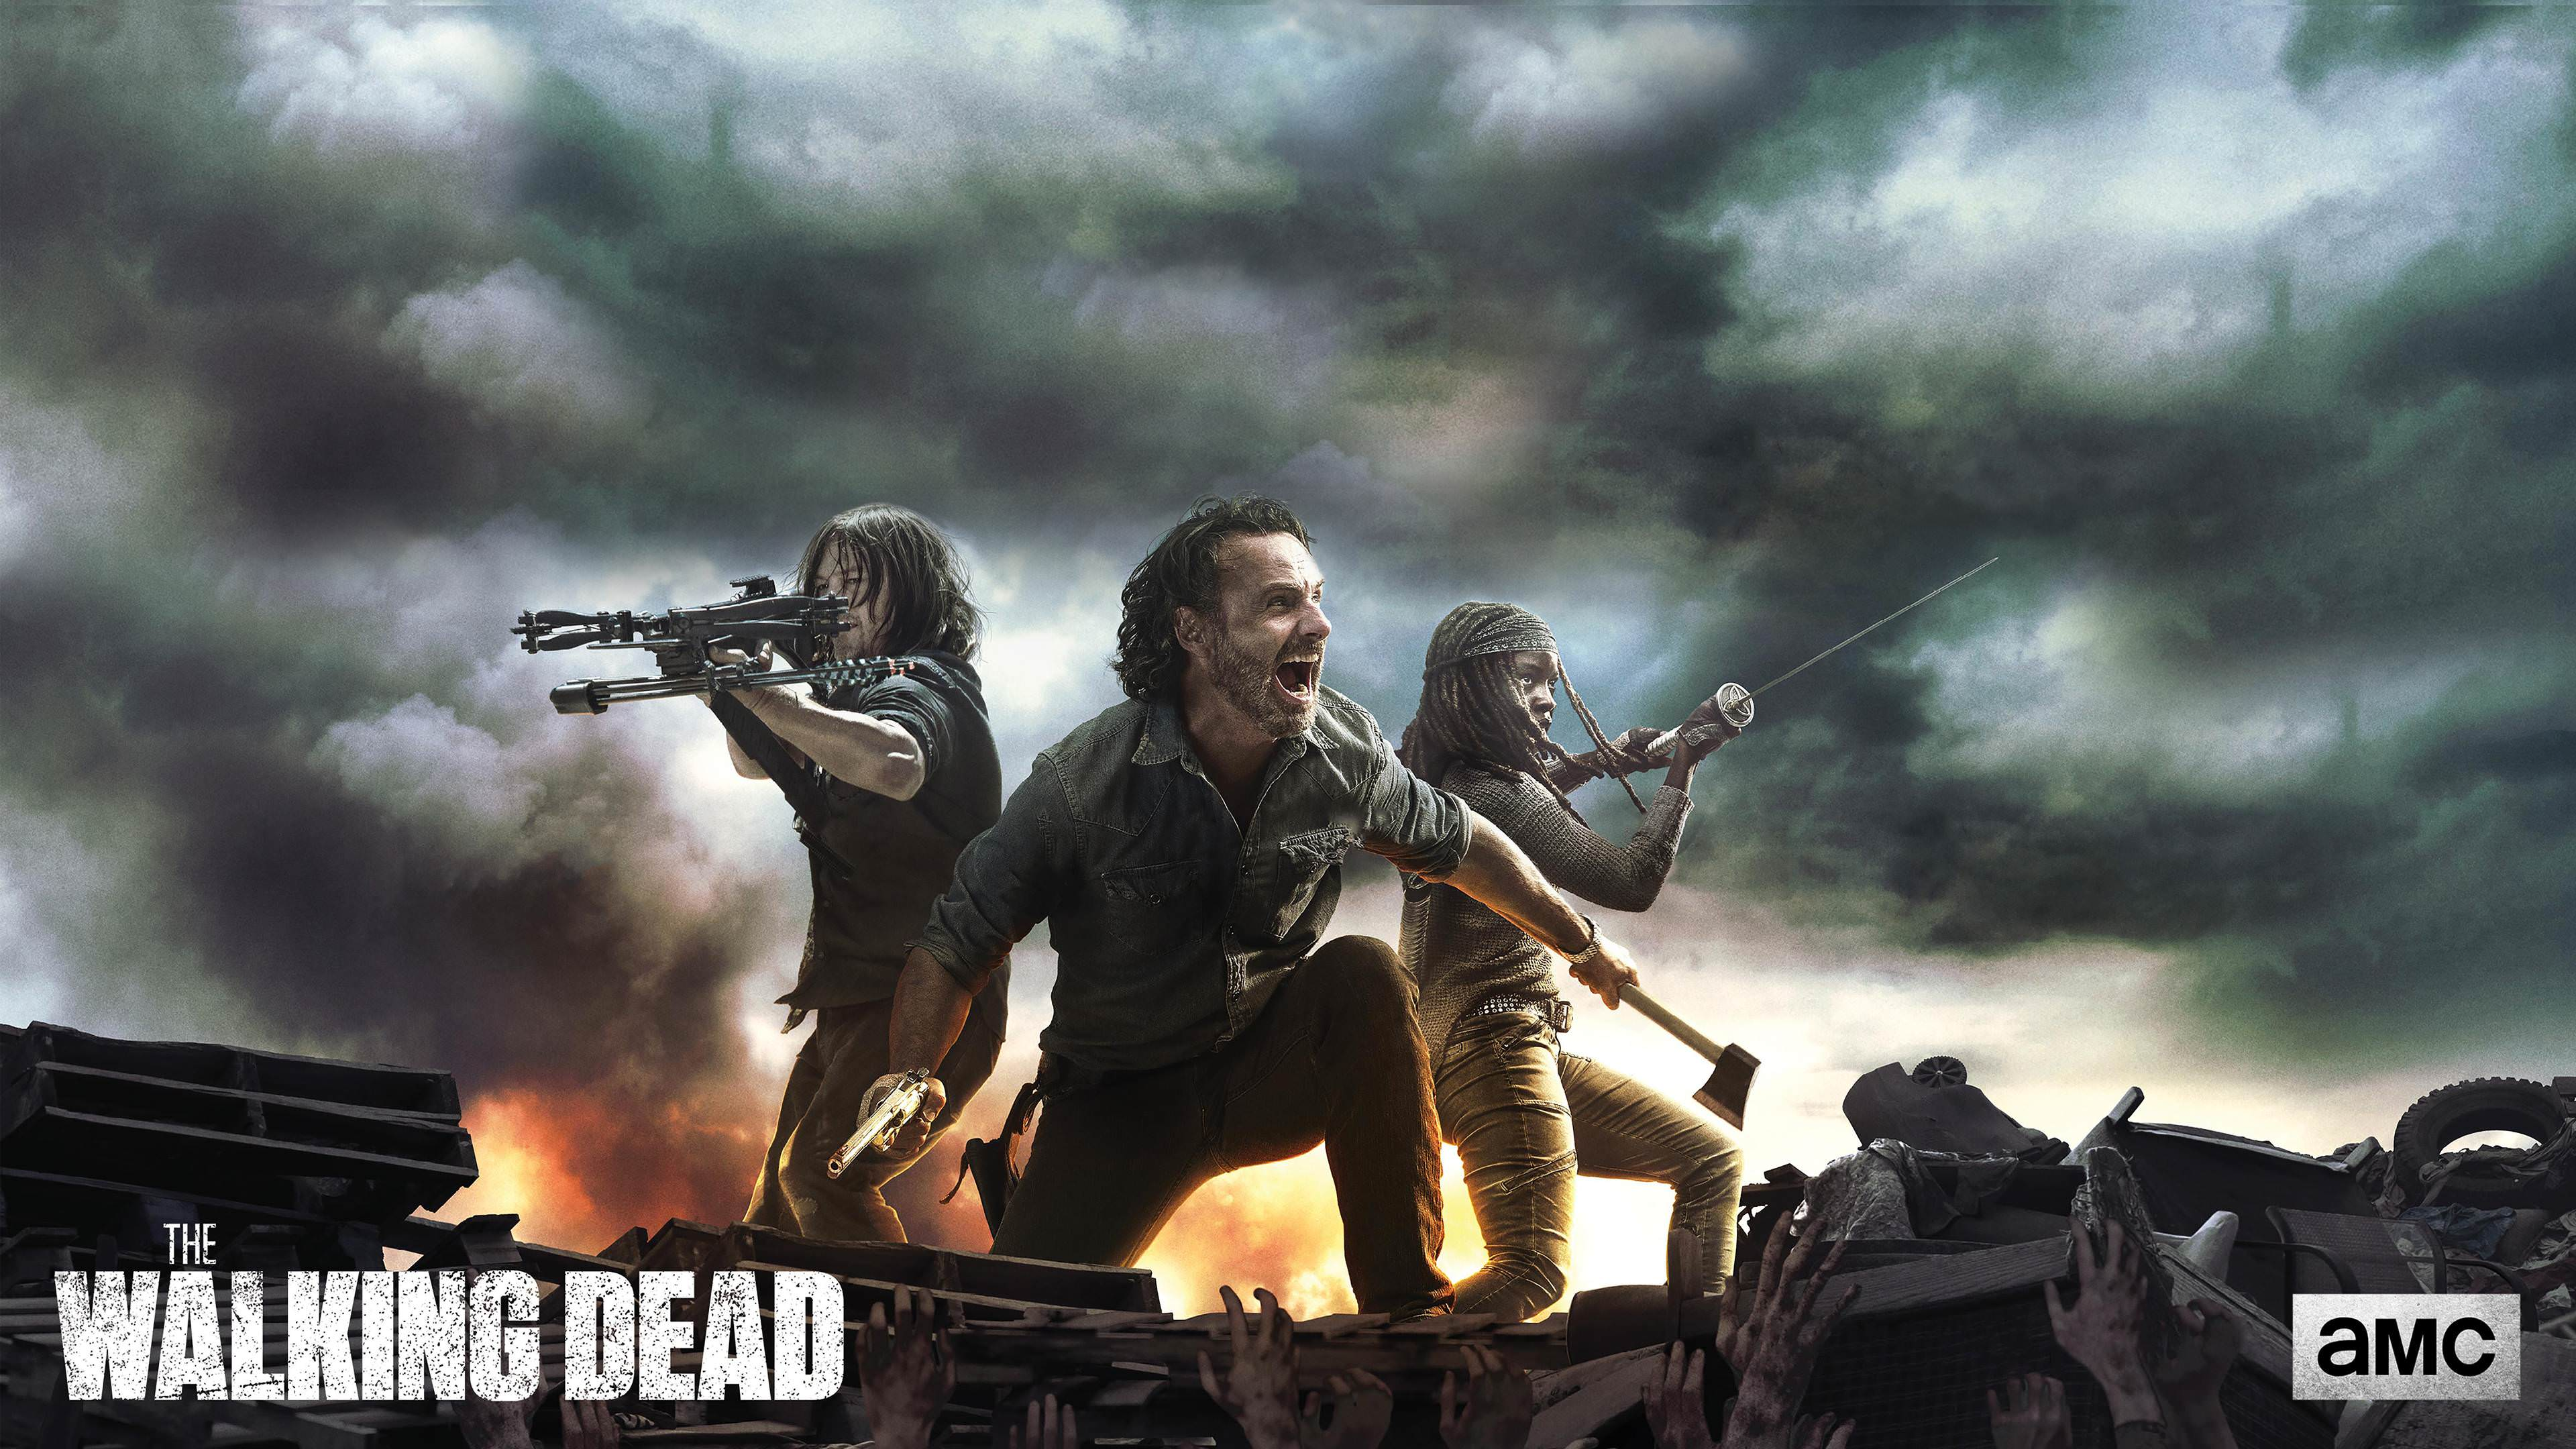 The Walking Dead The Final Season Wallpapers Wallpaper Cave